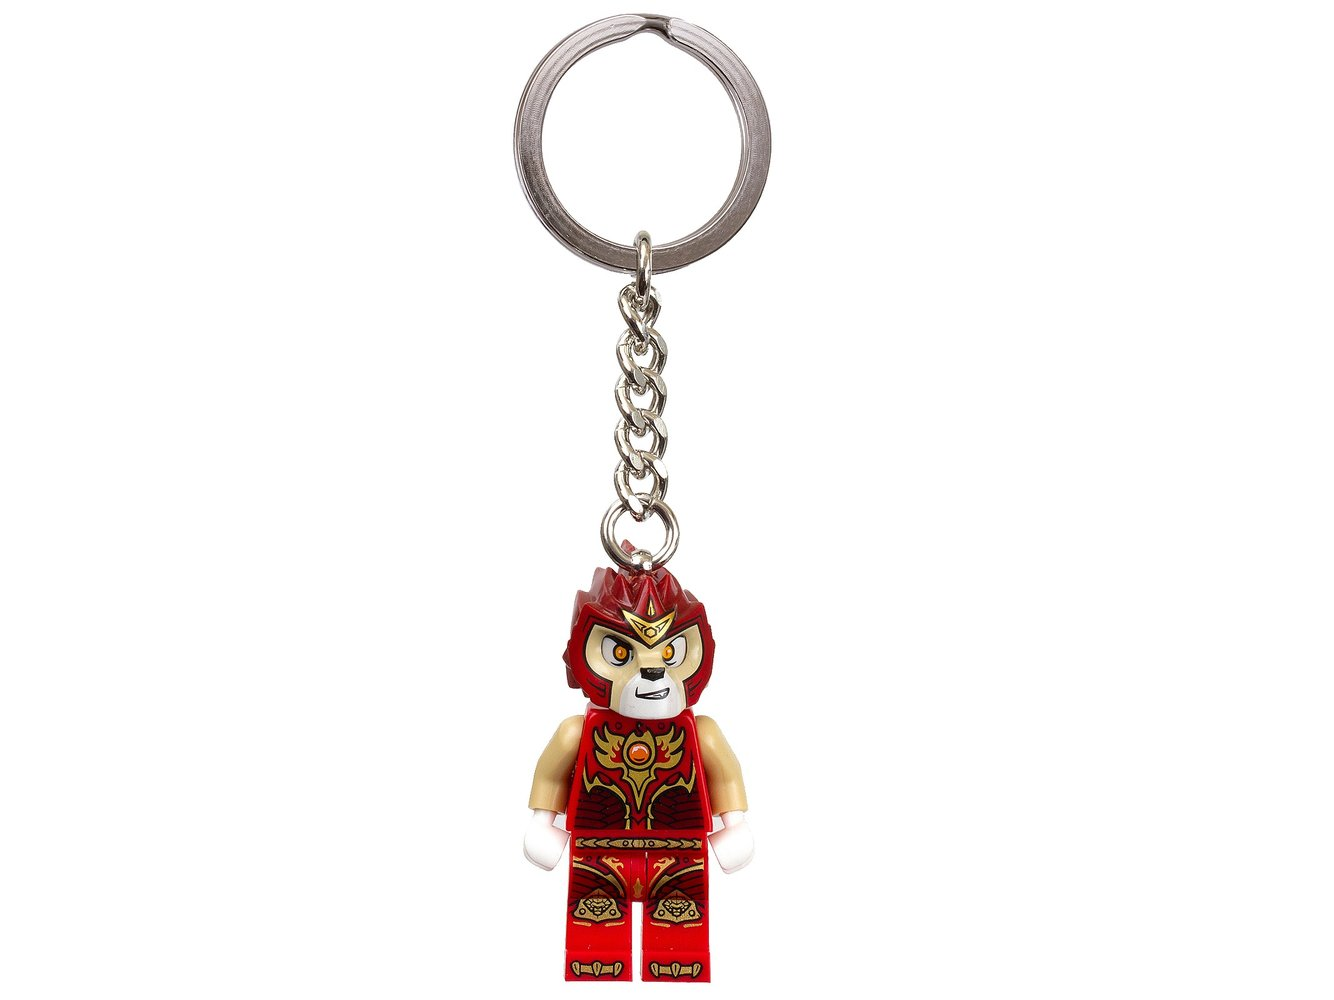 Laval Key Chain